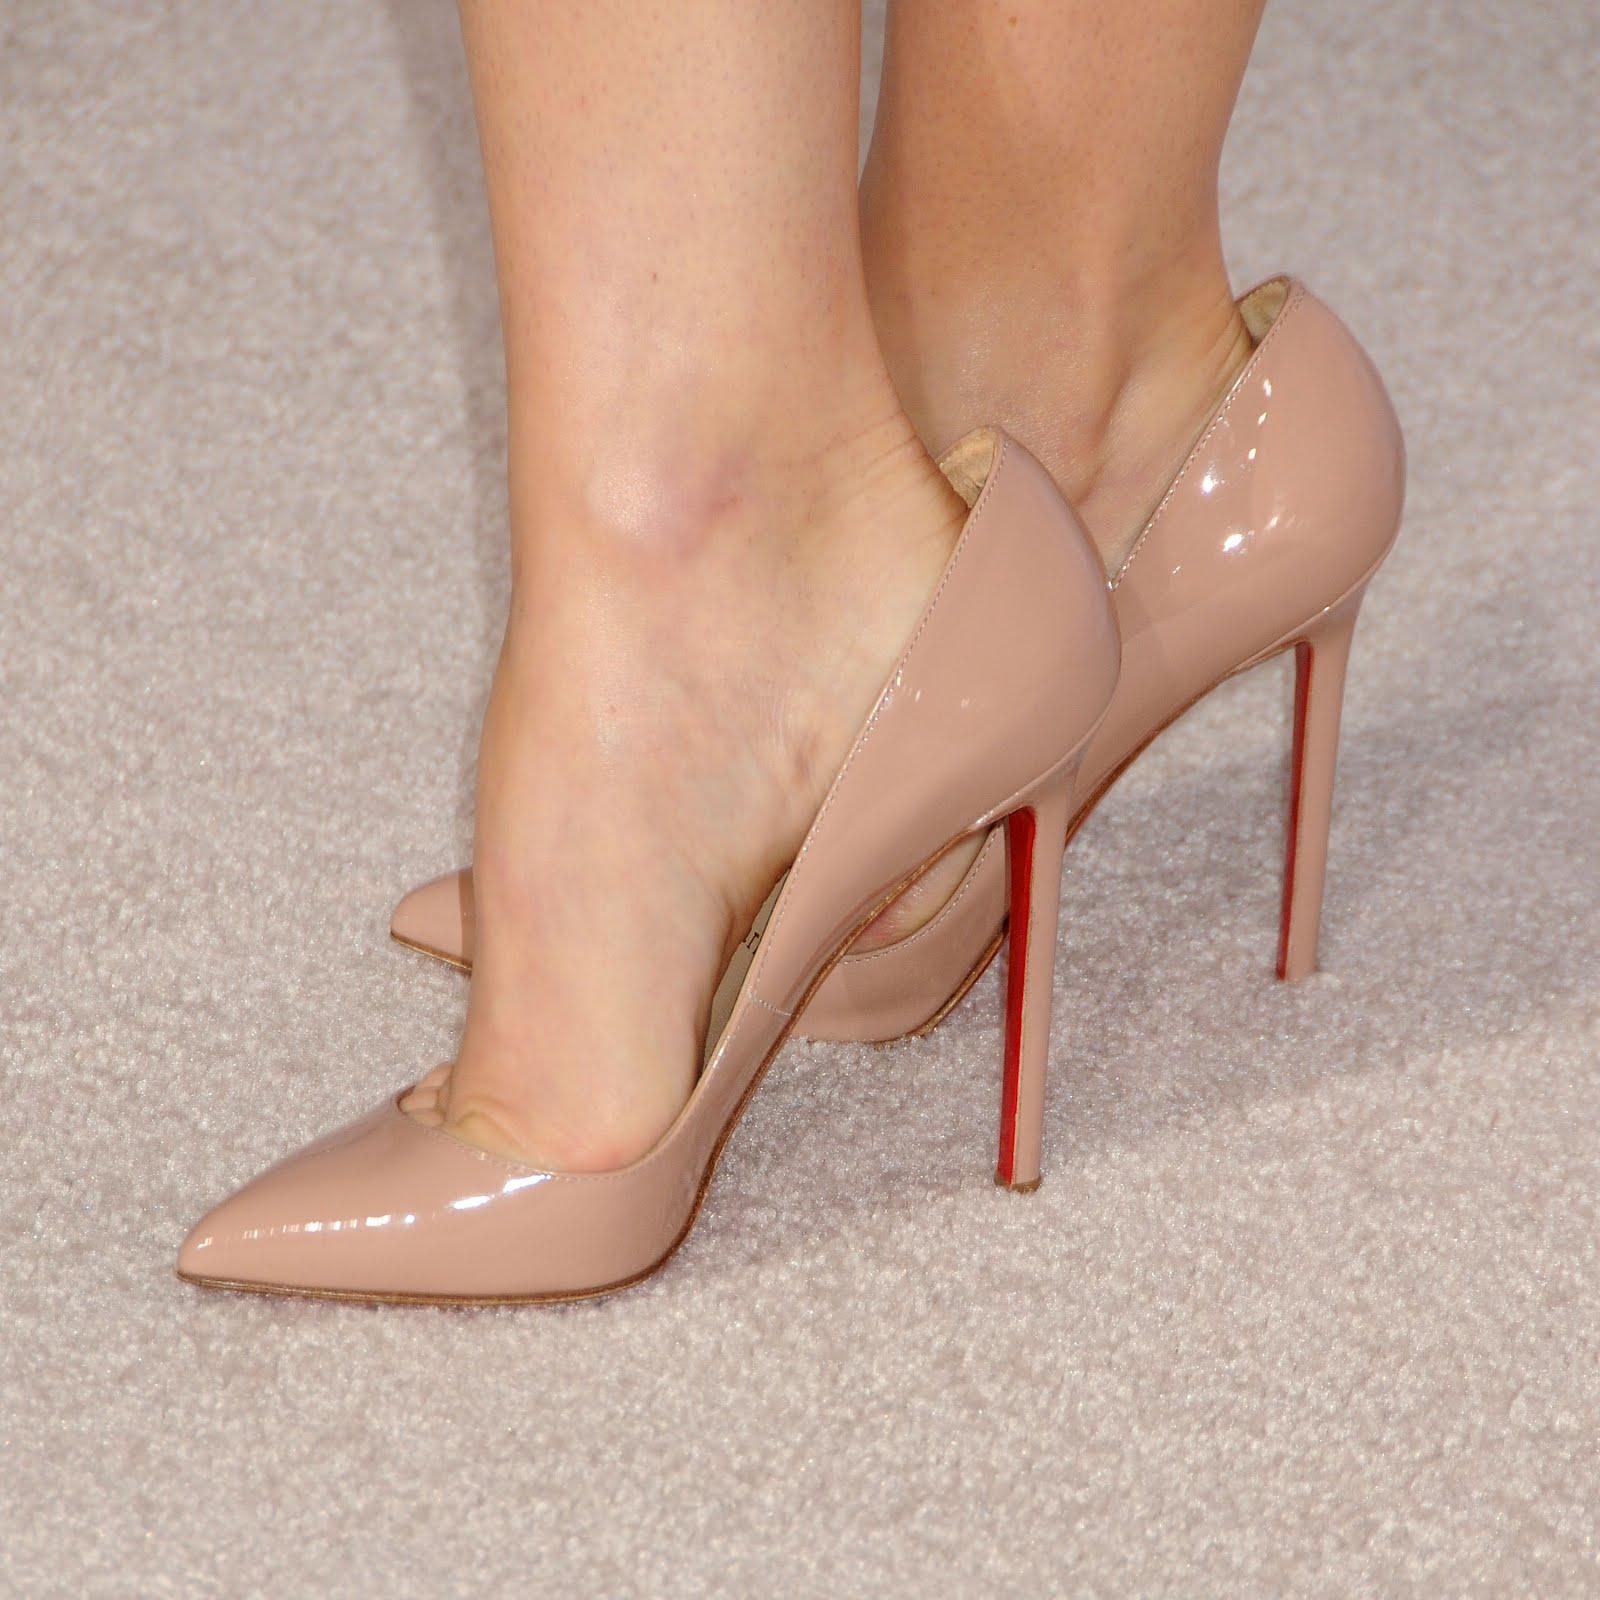 High Heel Shoe Toe Cleavage